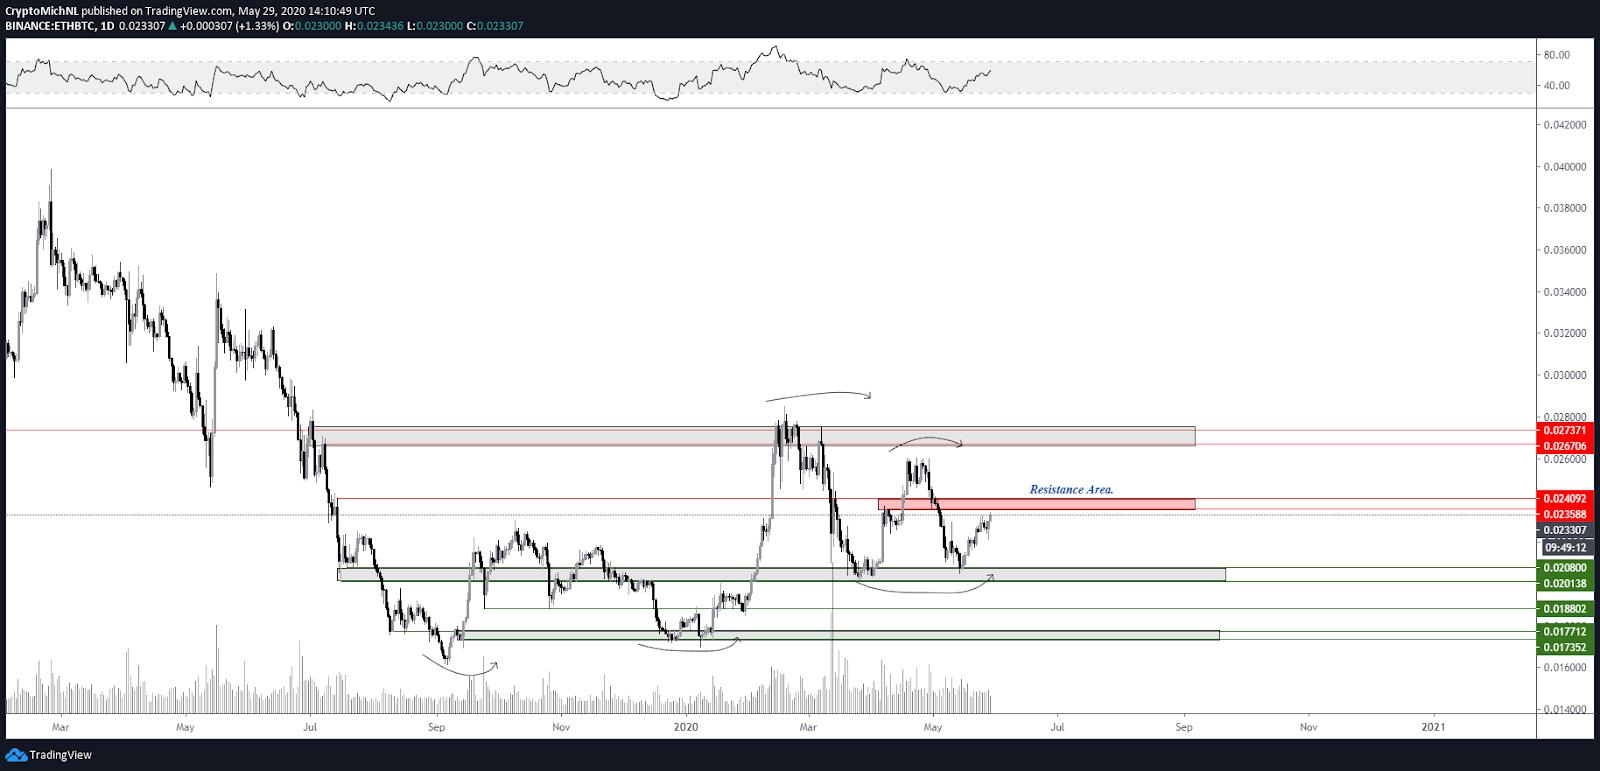 ETH BTC 1-day chart. Source: TradingView